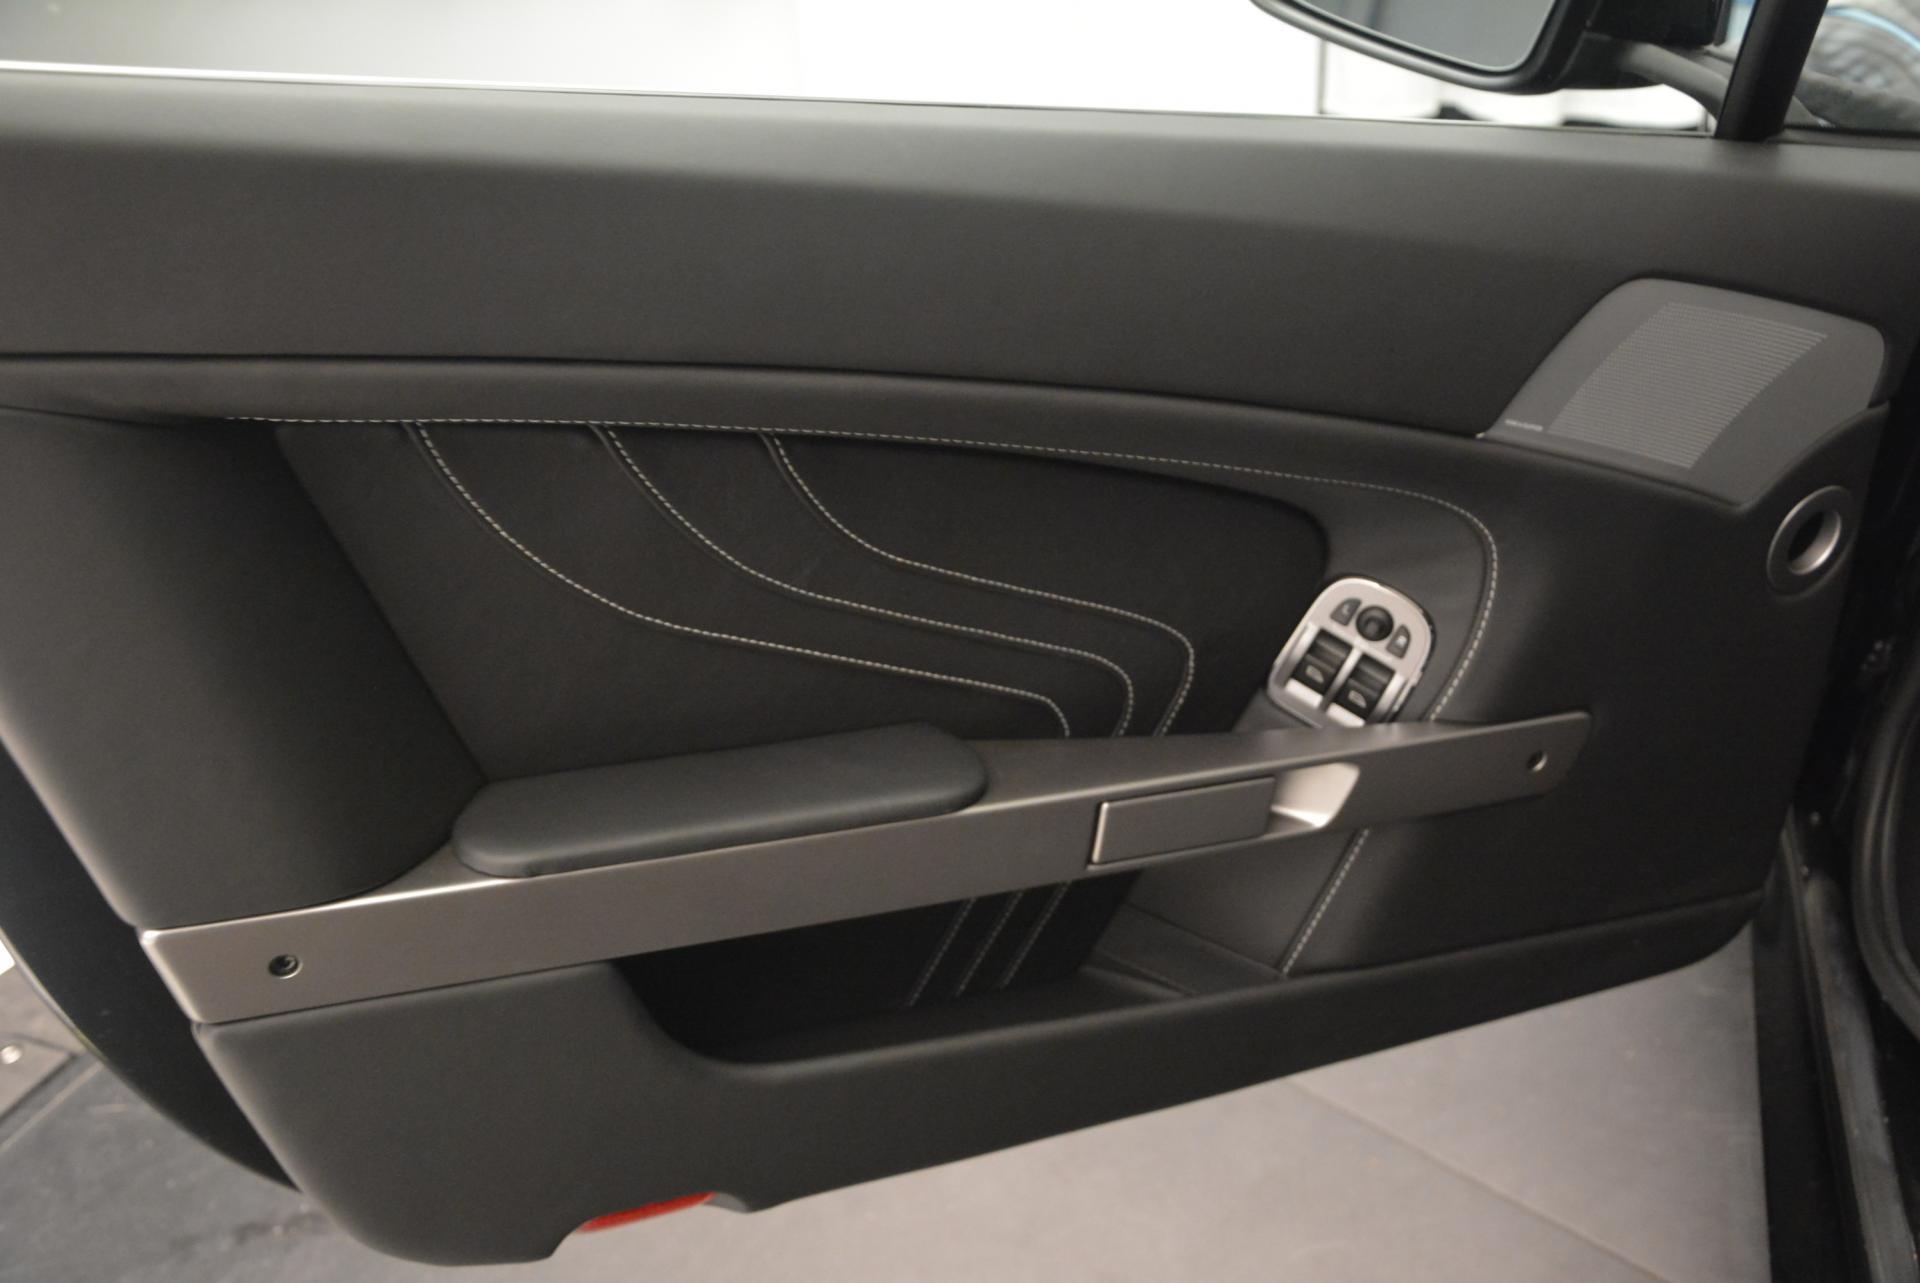 New 2016 Aston Martin V8 Vantage GTS S For Sale In Greenwich, CT 526_p14